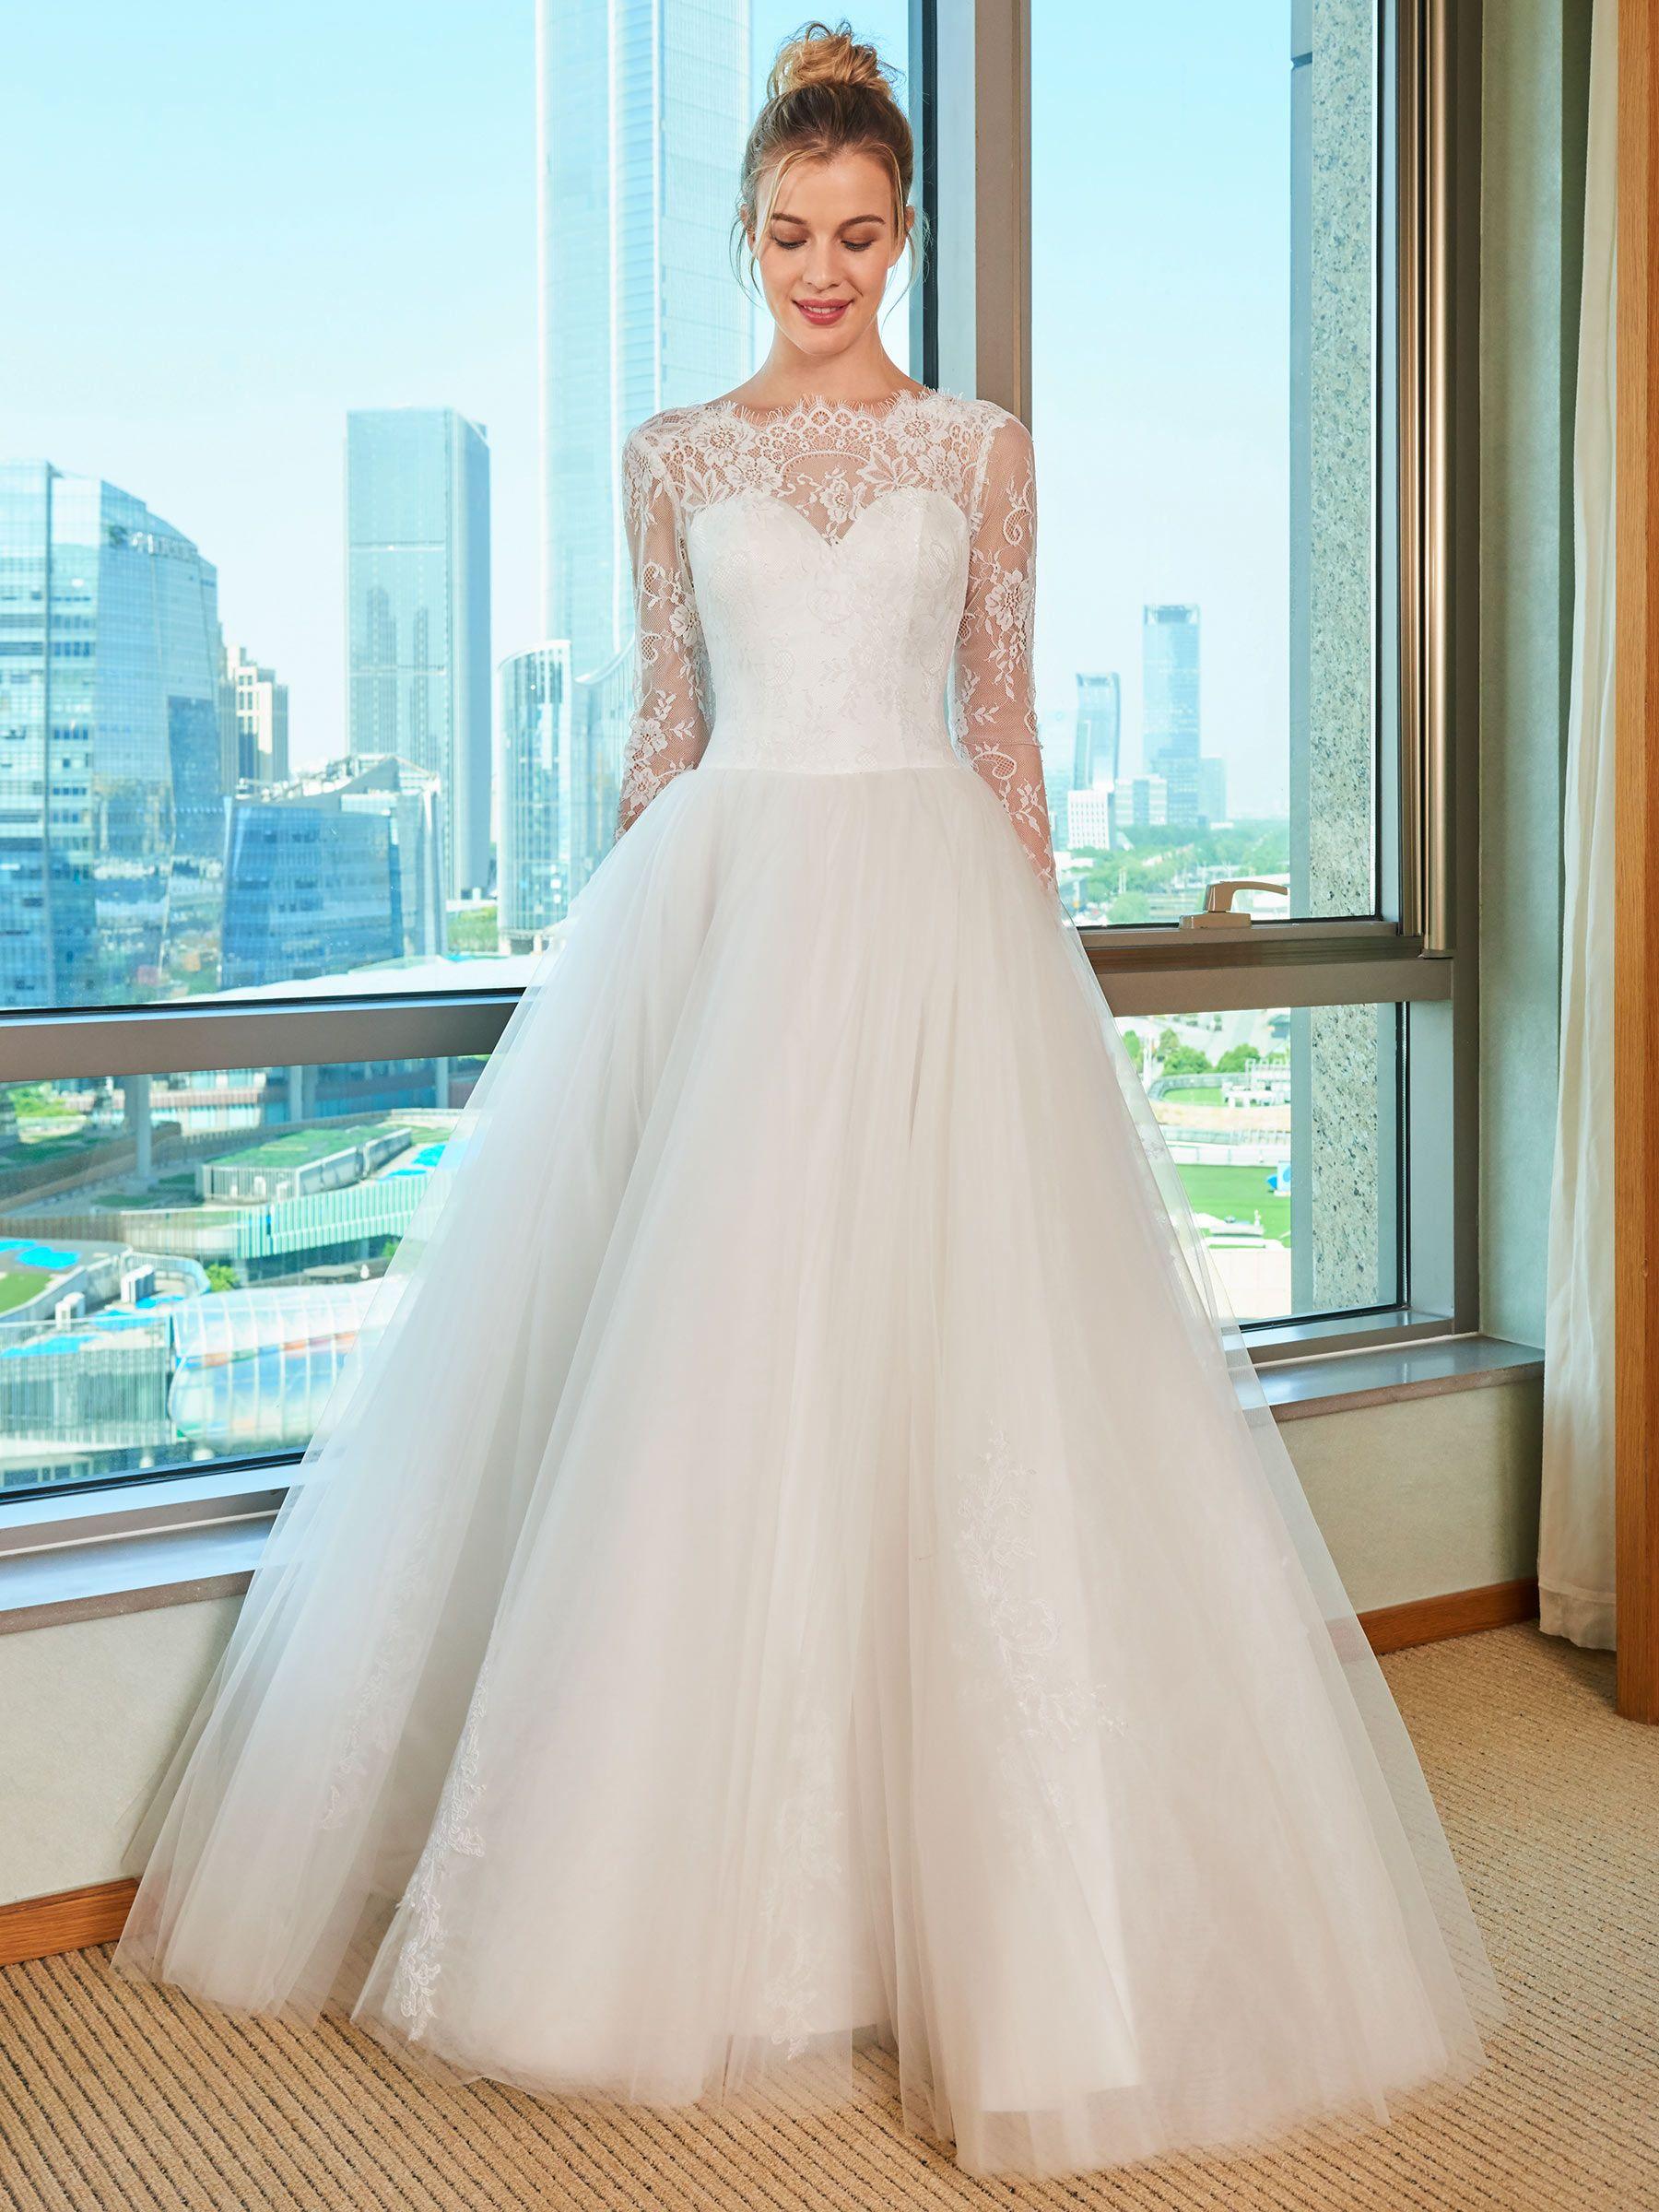 Lace top long sleeve wedding dress wedding dress weddings and wedding